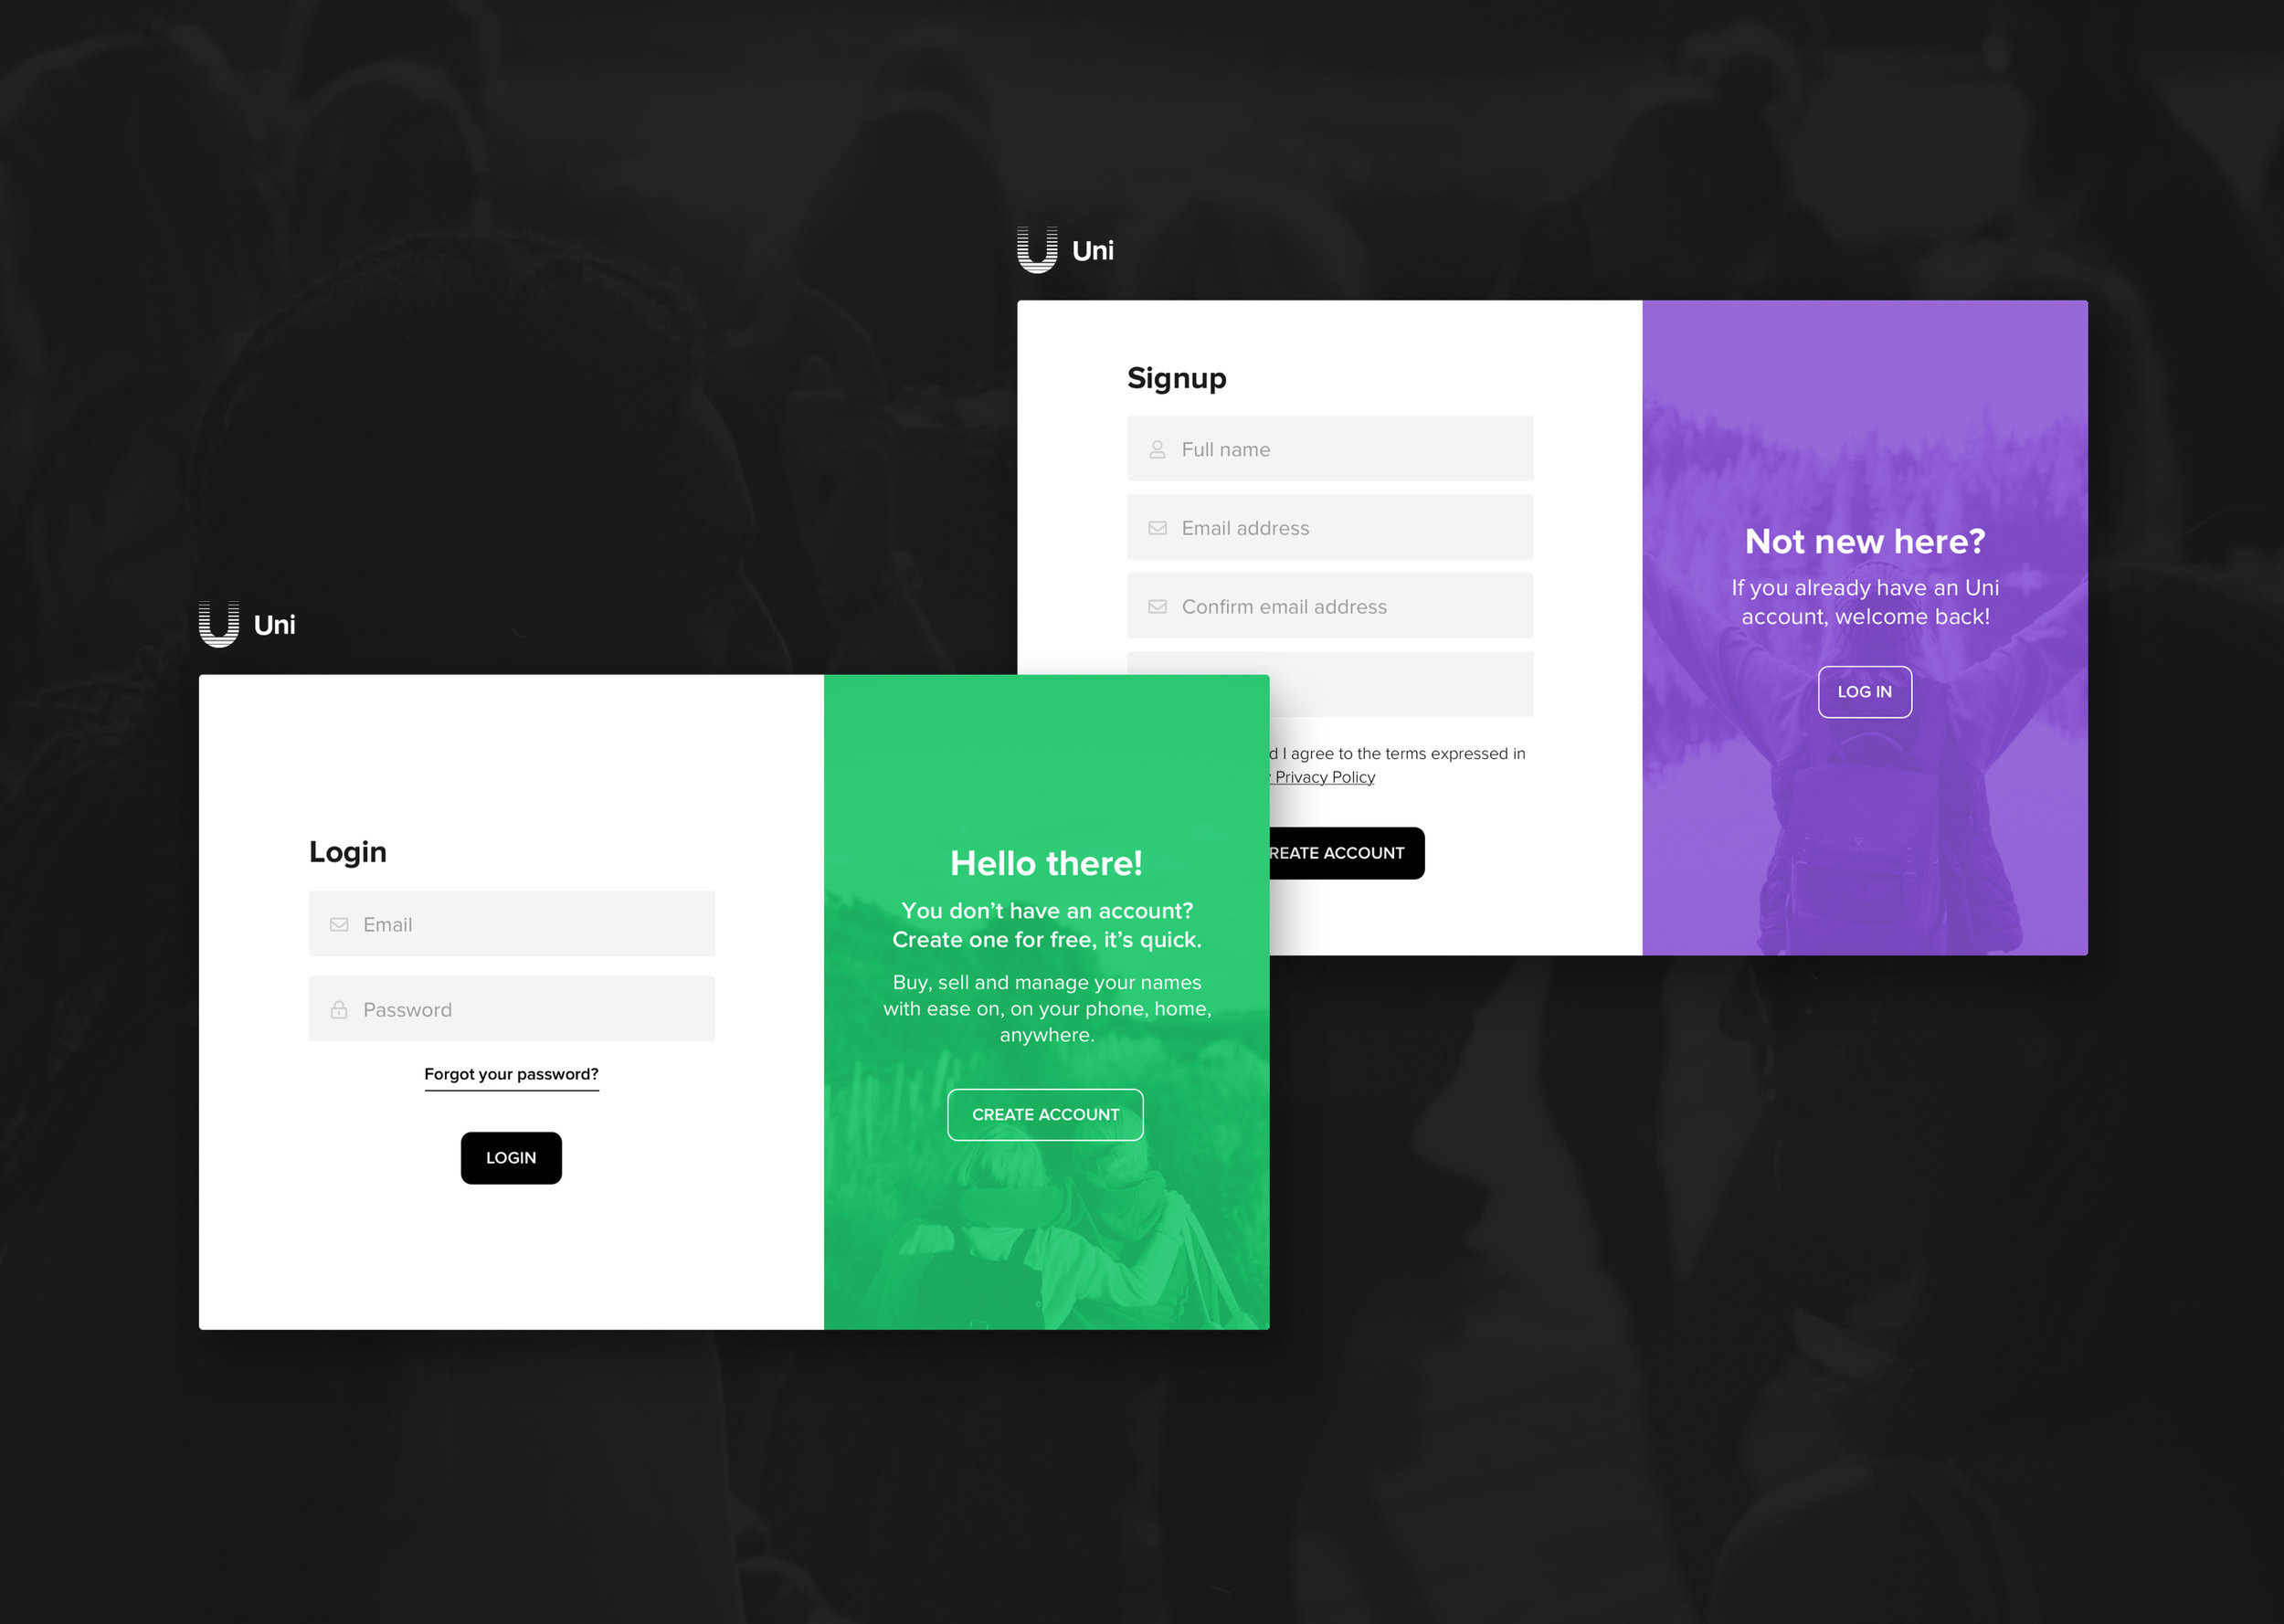 Uniregistry.com redesign (login/signup)